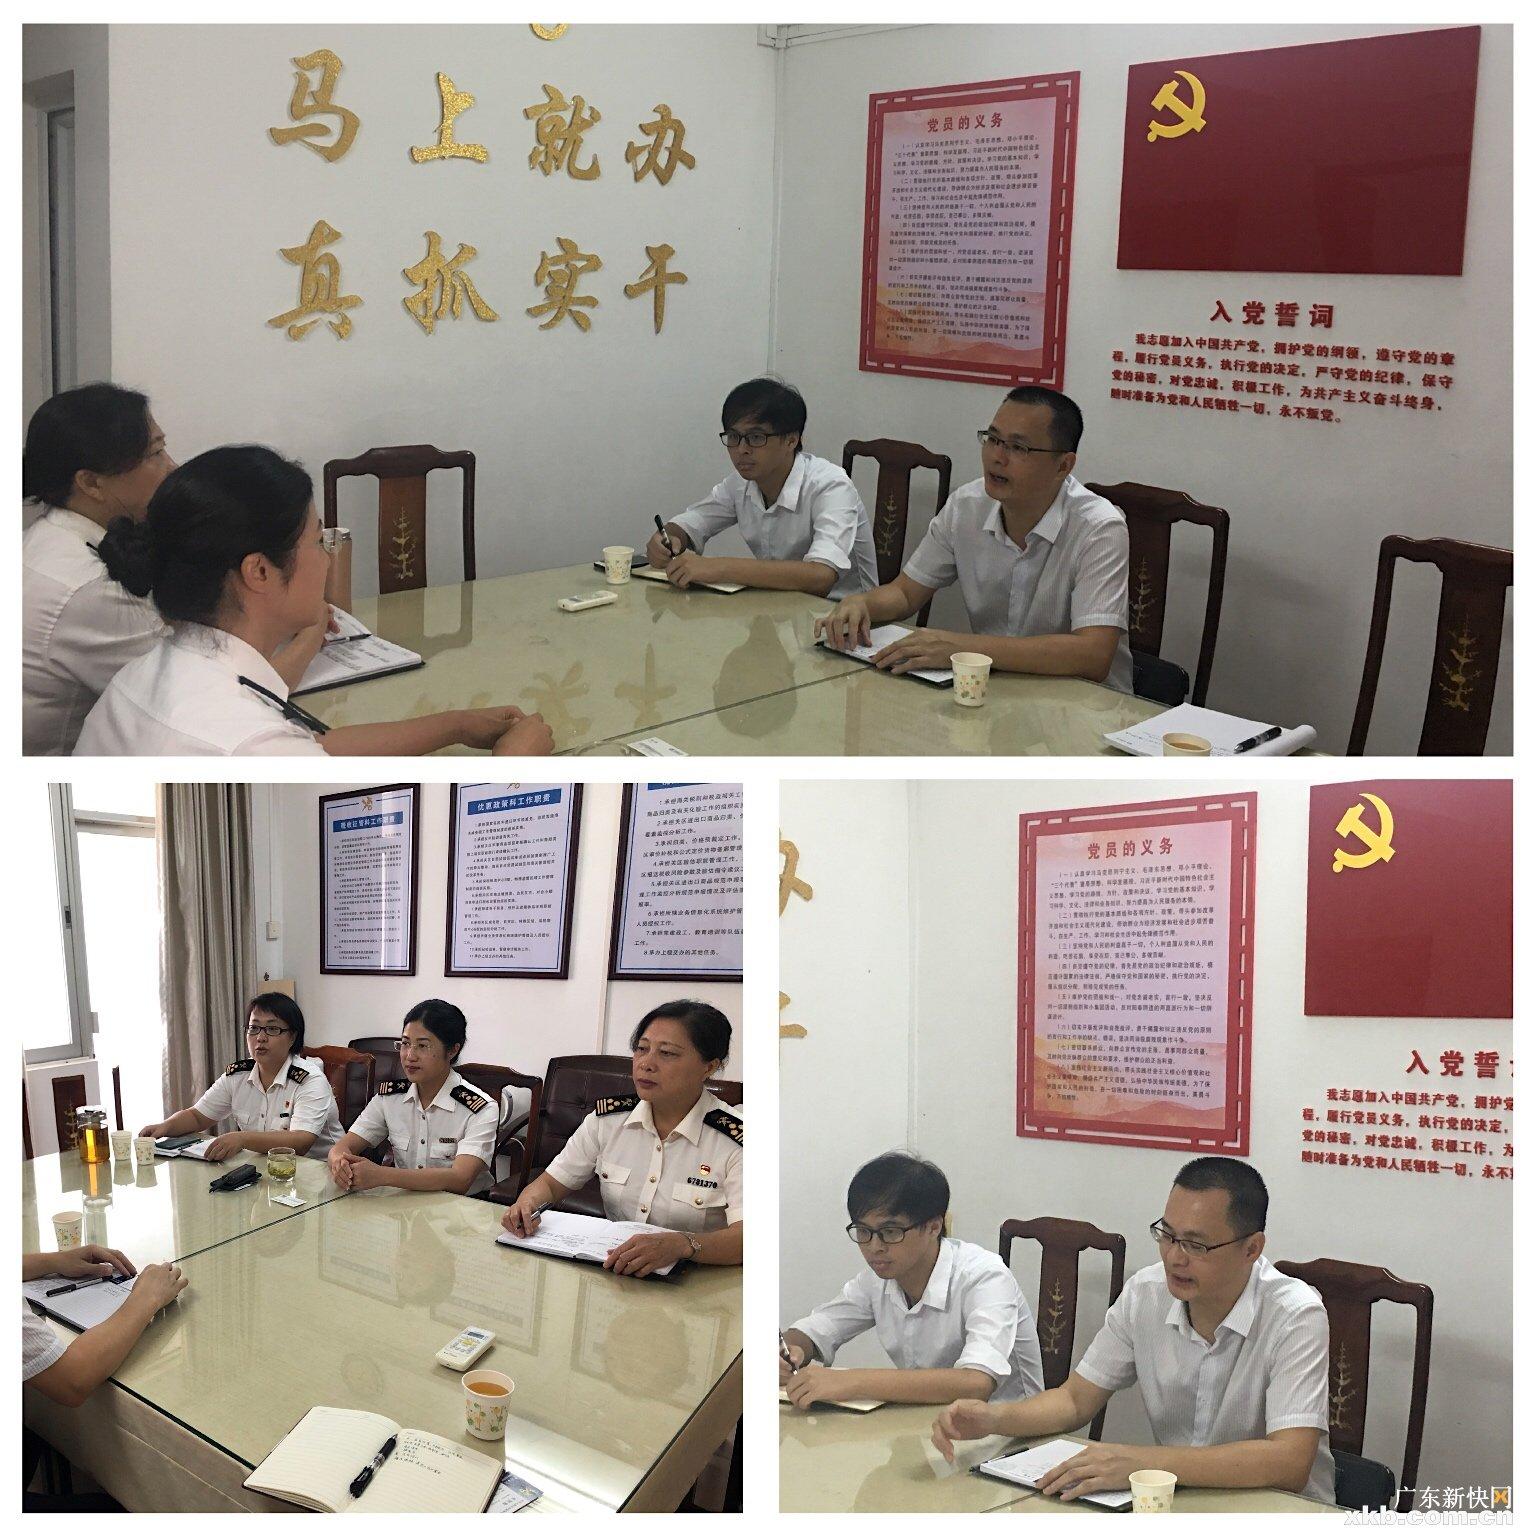 http://www.880759.com/wenhuayichan/10825.html